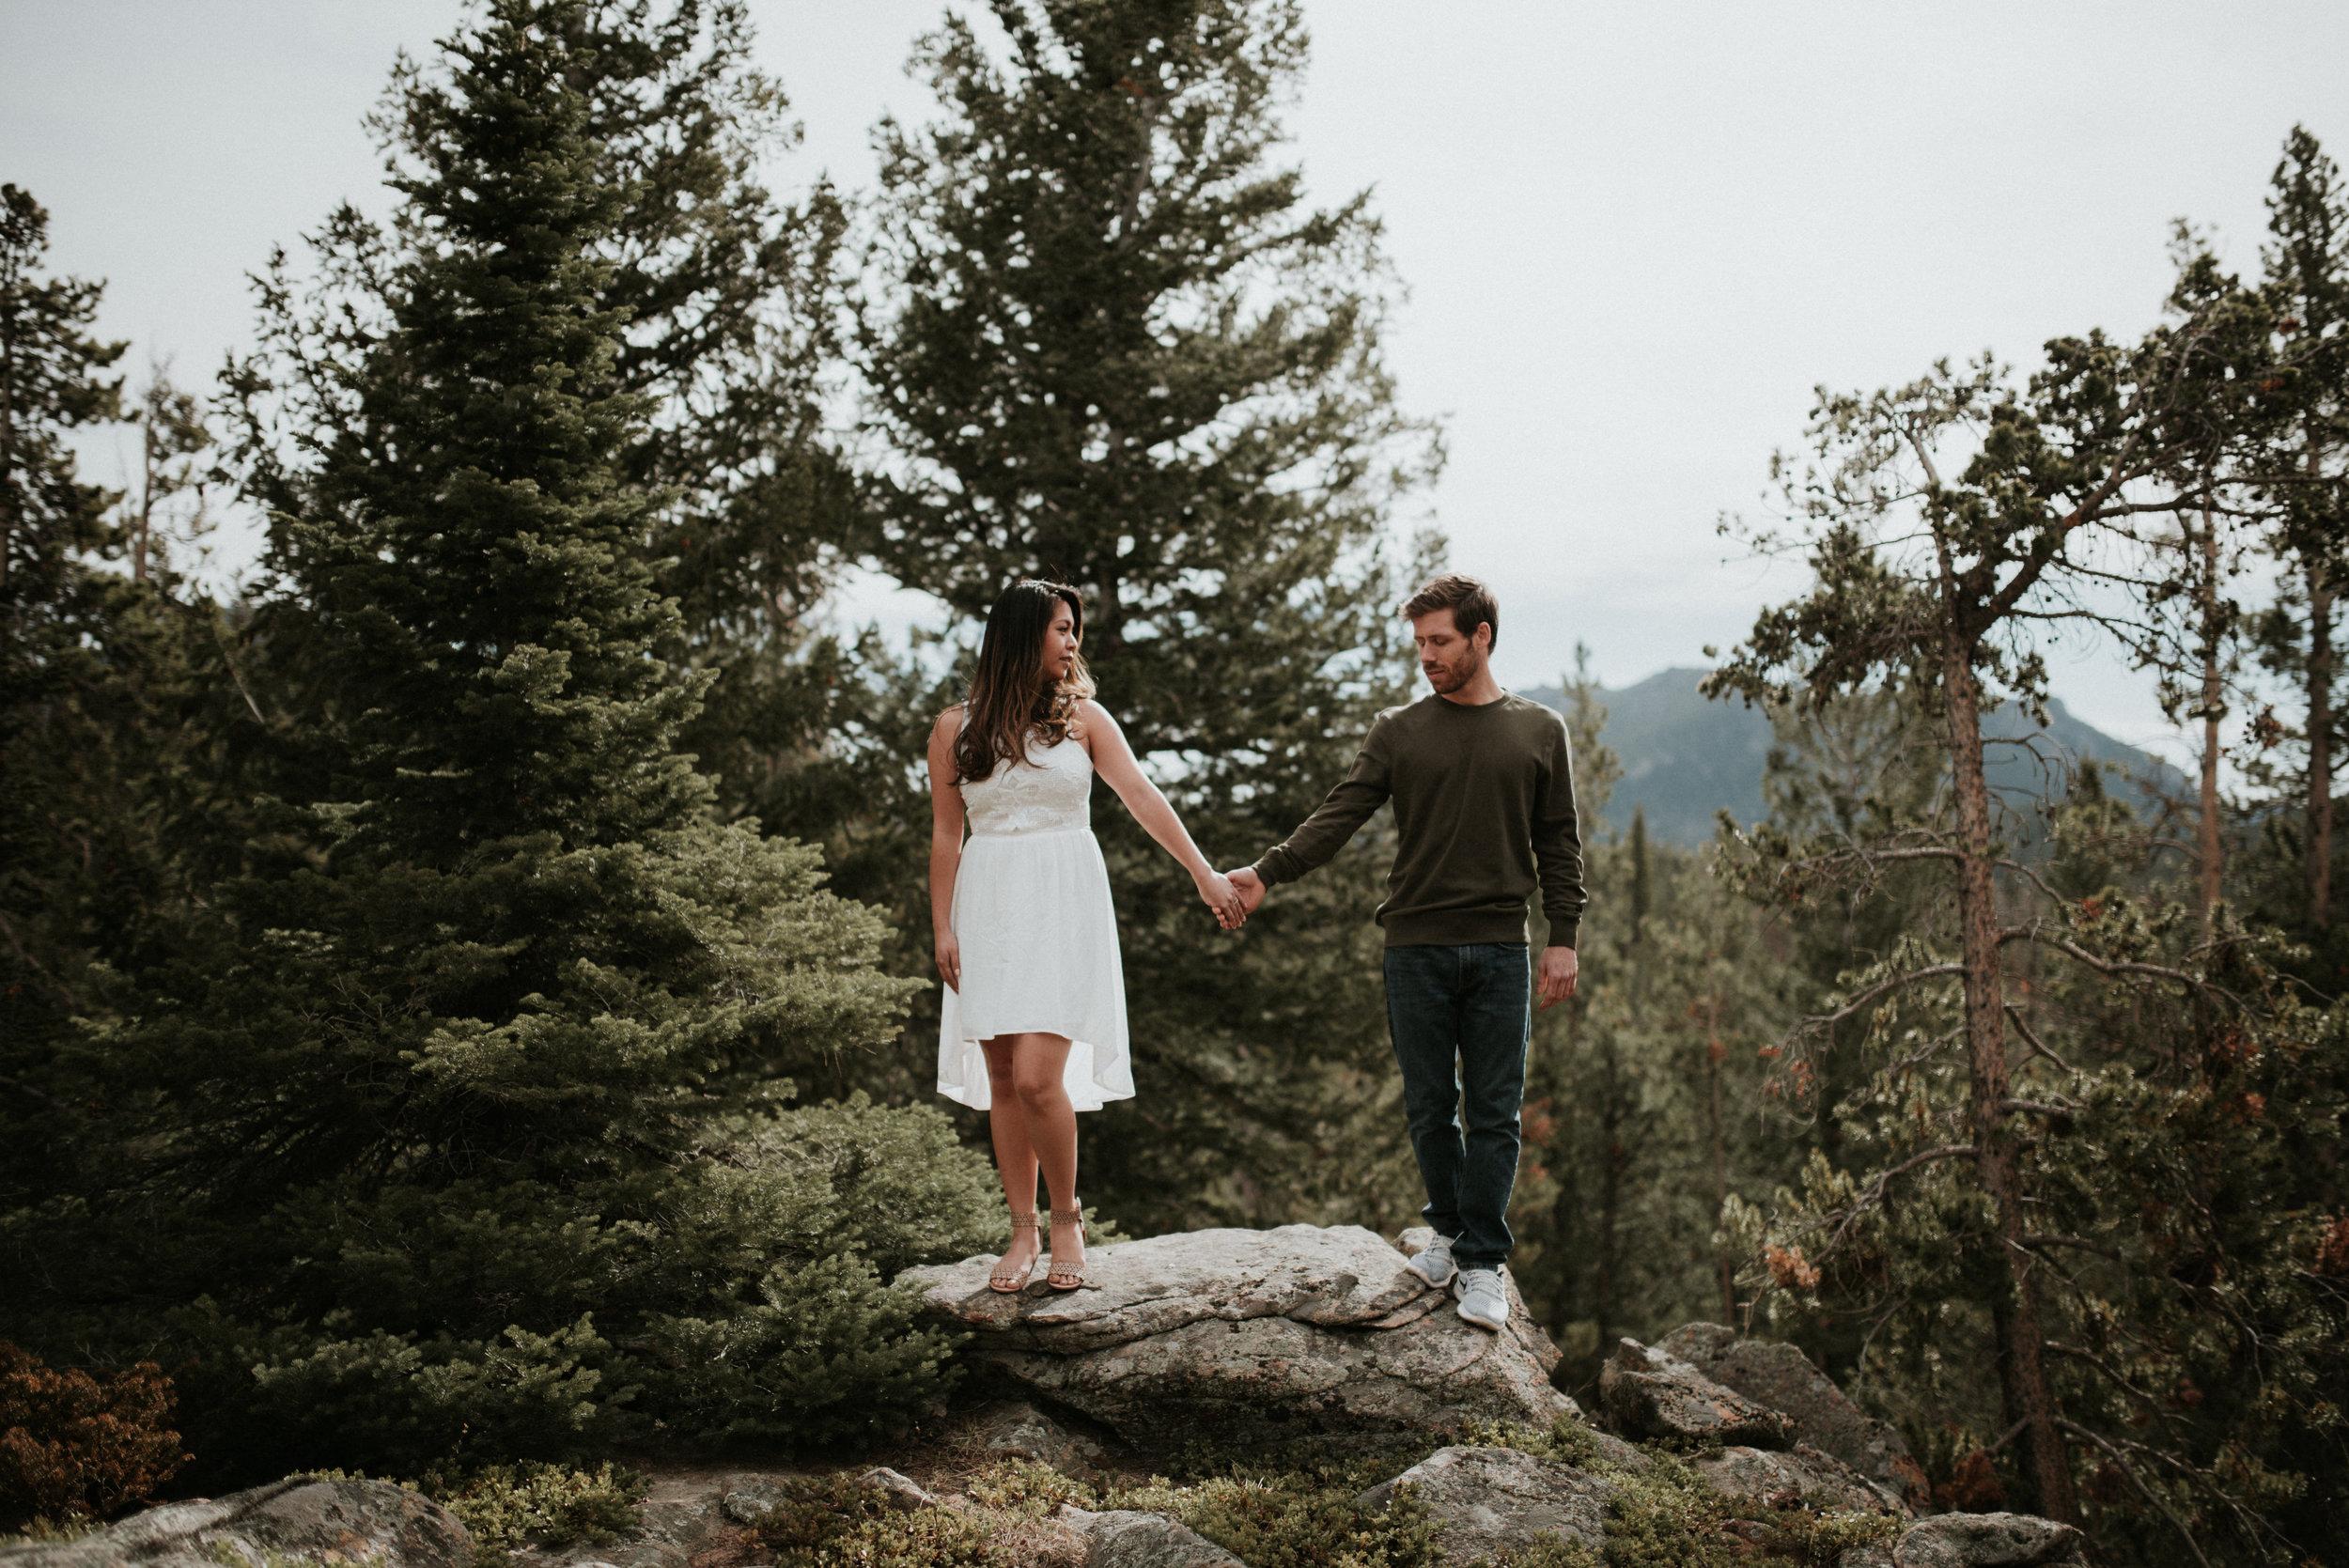 Zach&Rosalie Rocky Mountain National Park Engagement Denver Colorado Rocky Mountain Wedding Photographer00019.jpg